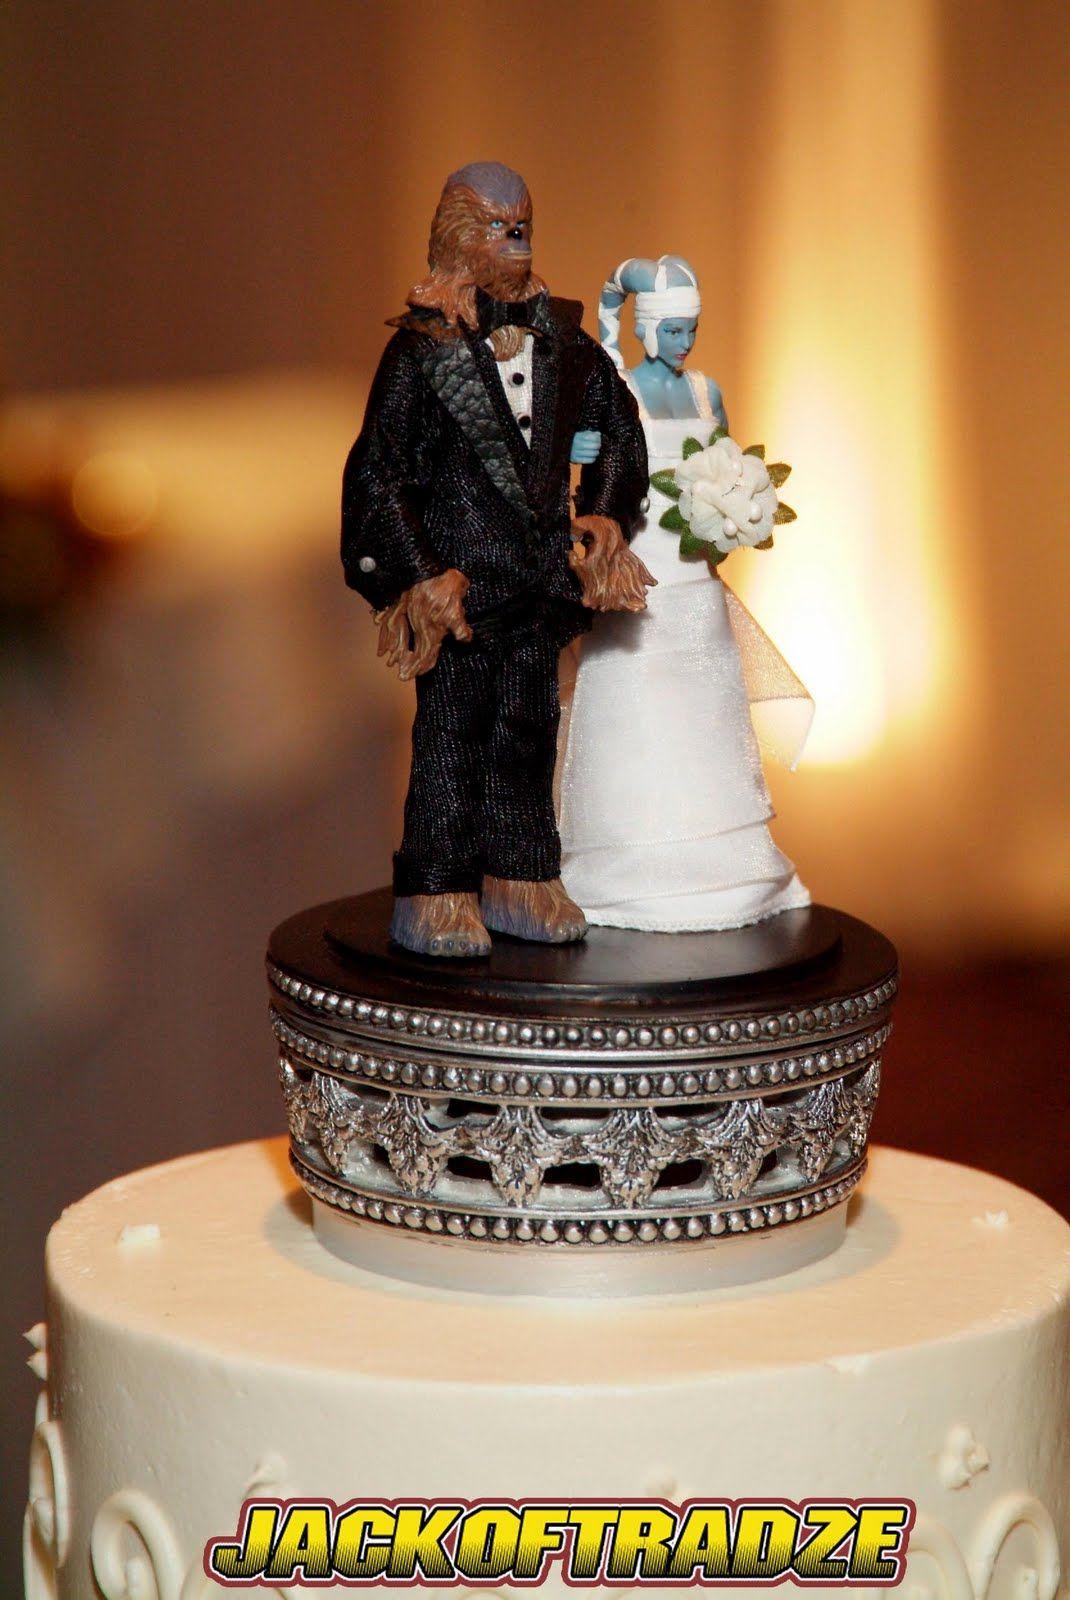 Star Wars Cake Topper Haha Amanda Snelson Bordine Star Wars